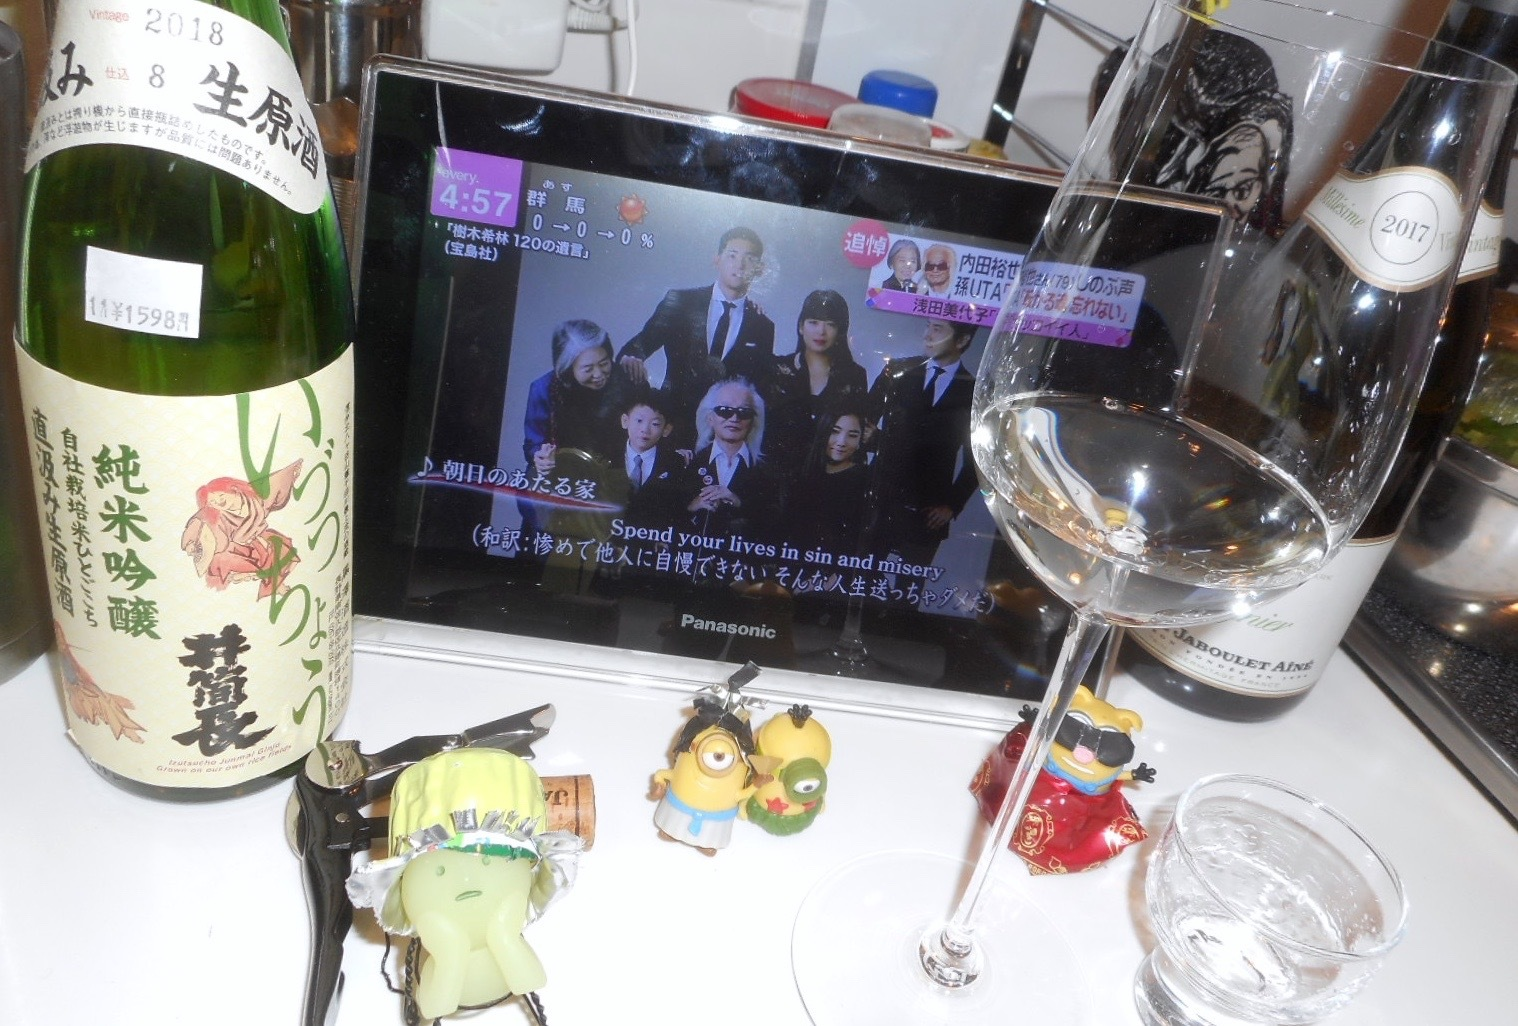 izutsuchou_jikagumi30by2_8.jpg